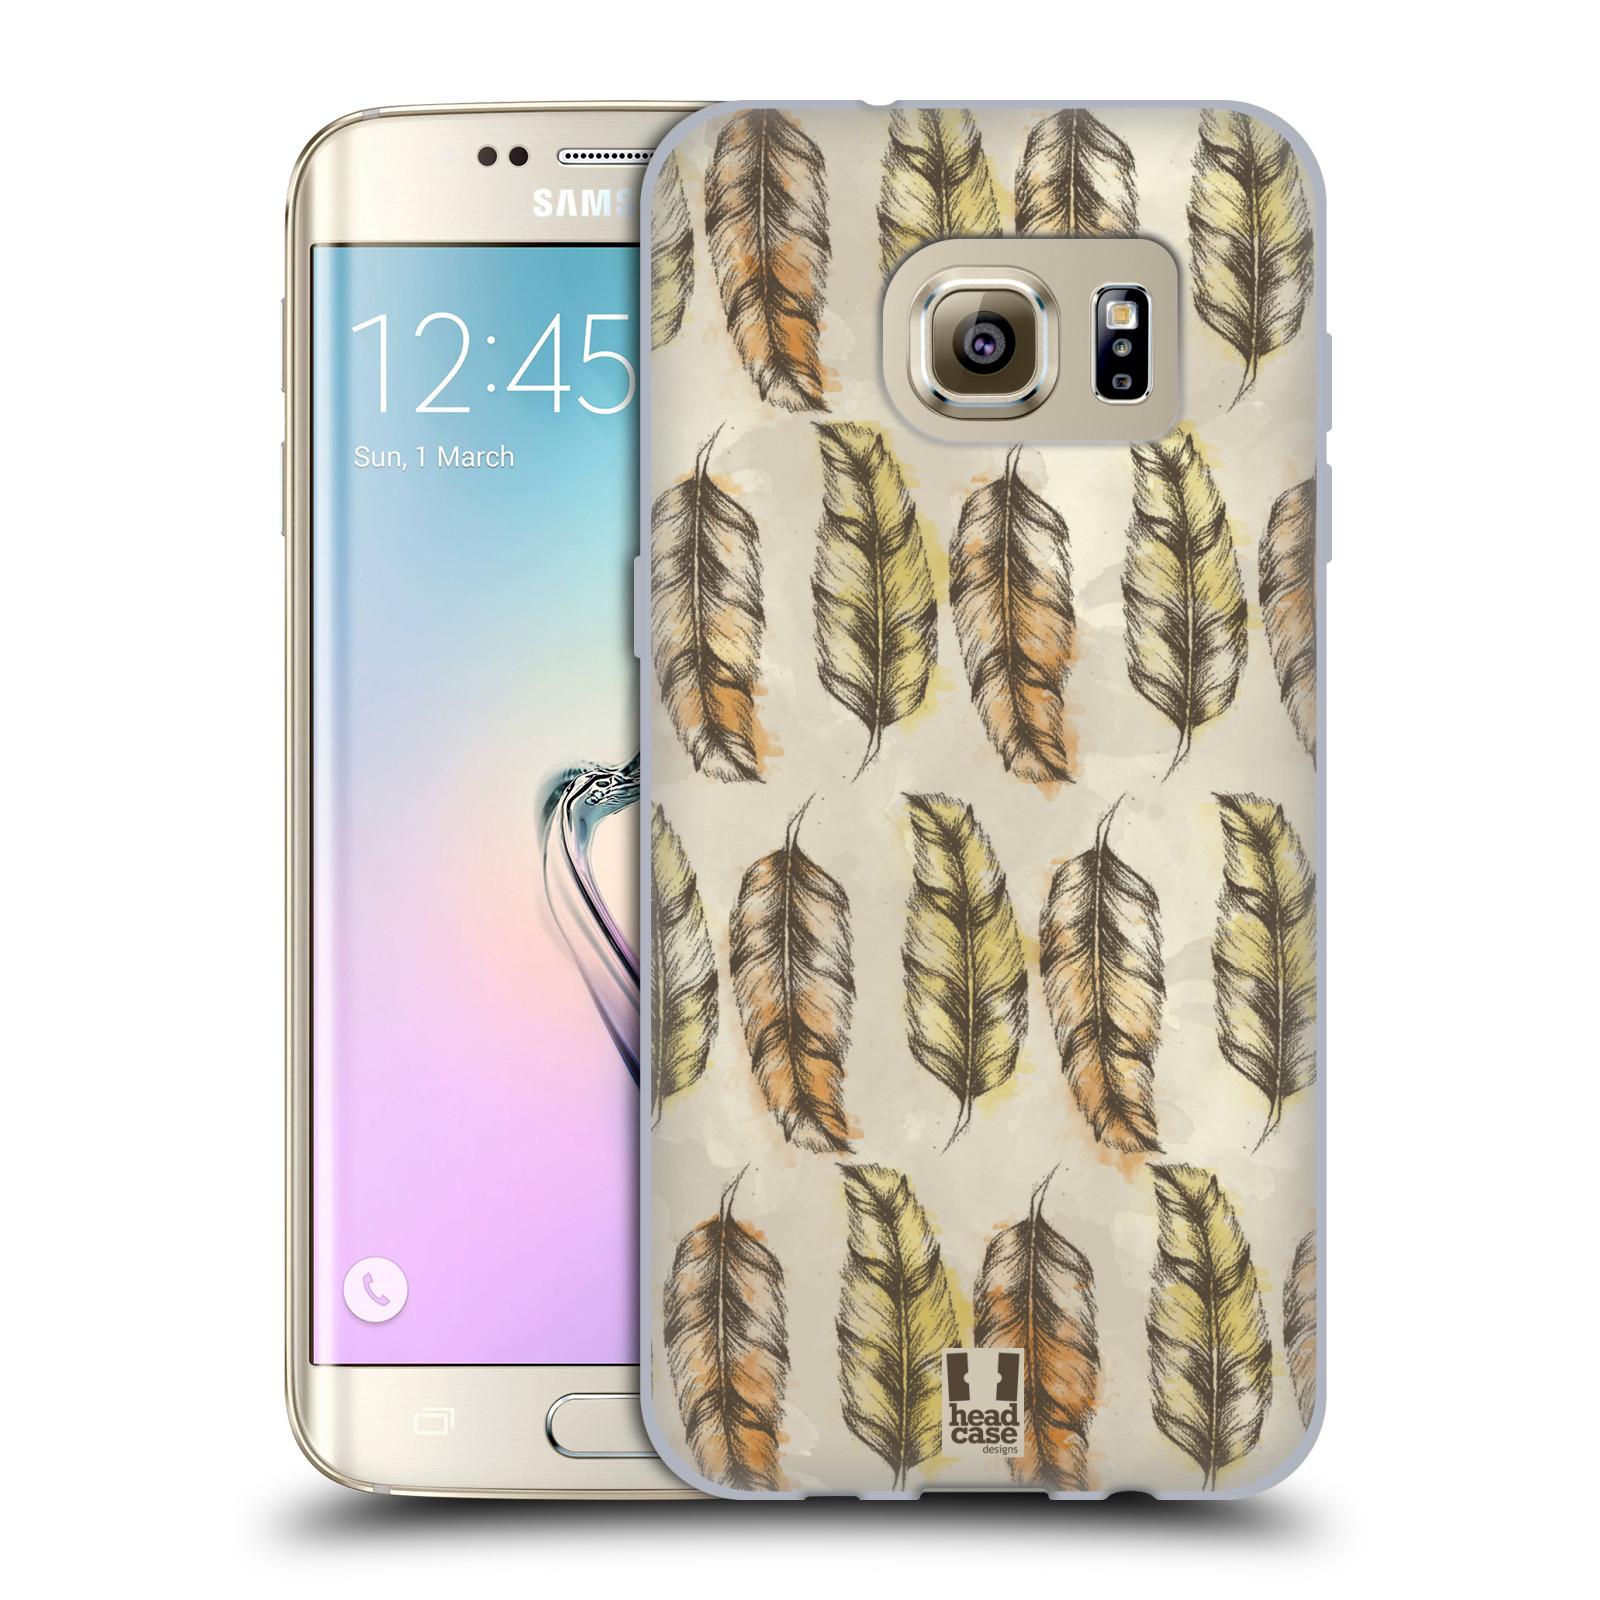 Silikonové pouzdro na mobil Samsung Galaxy S7 Edge - Head Case - Bohémská pírka (Silikonový kryt či obal na mobilní telefon s motivem Bohemian Soul pro Samsung Galaxy S7 Edge SM-G935F)